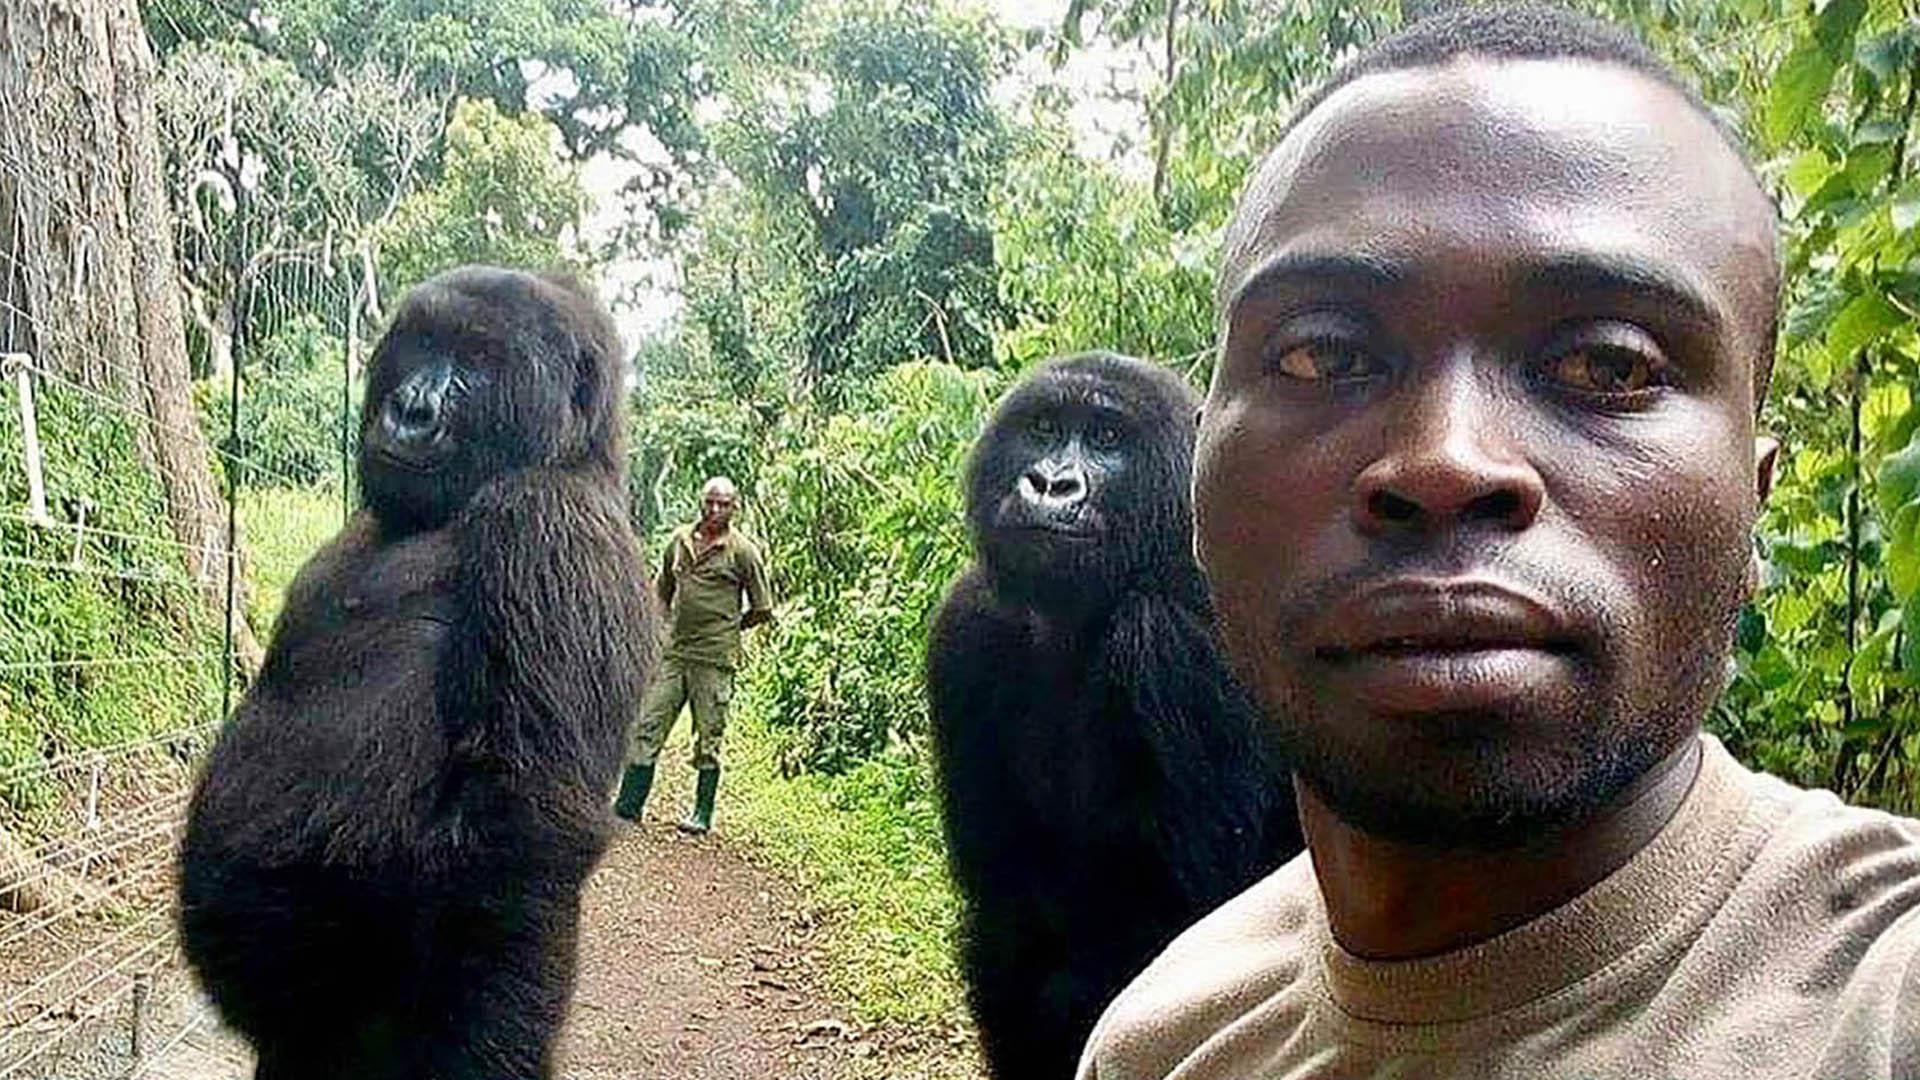 Ndakazi and Ndeze pose with a park ranger at Virunga National Park in the Democratic Republic of Congo. (Virunga National Park/Instagram)